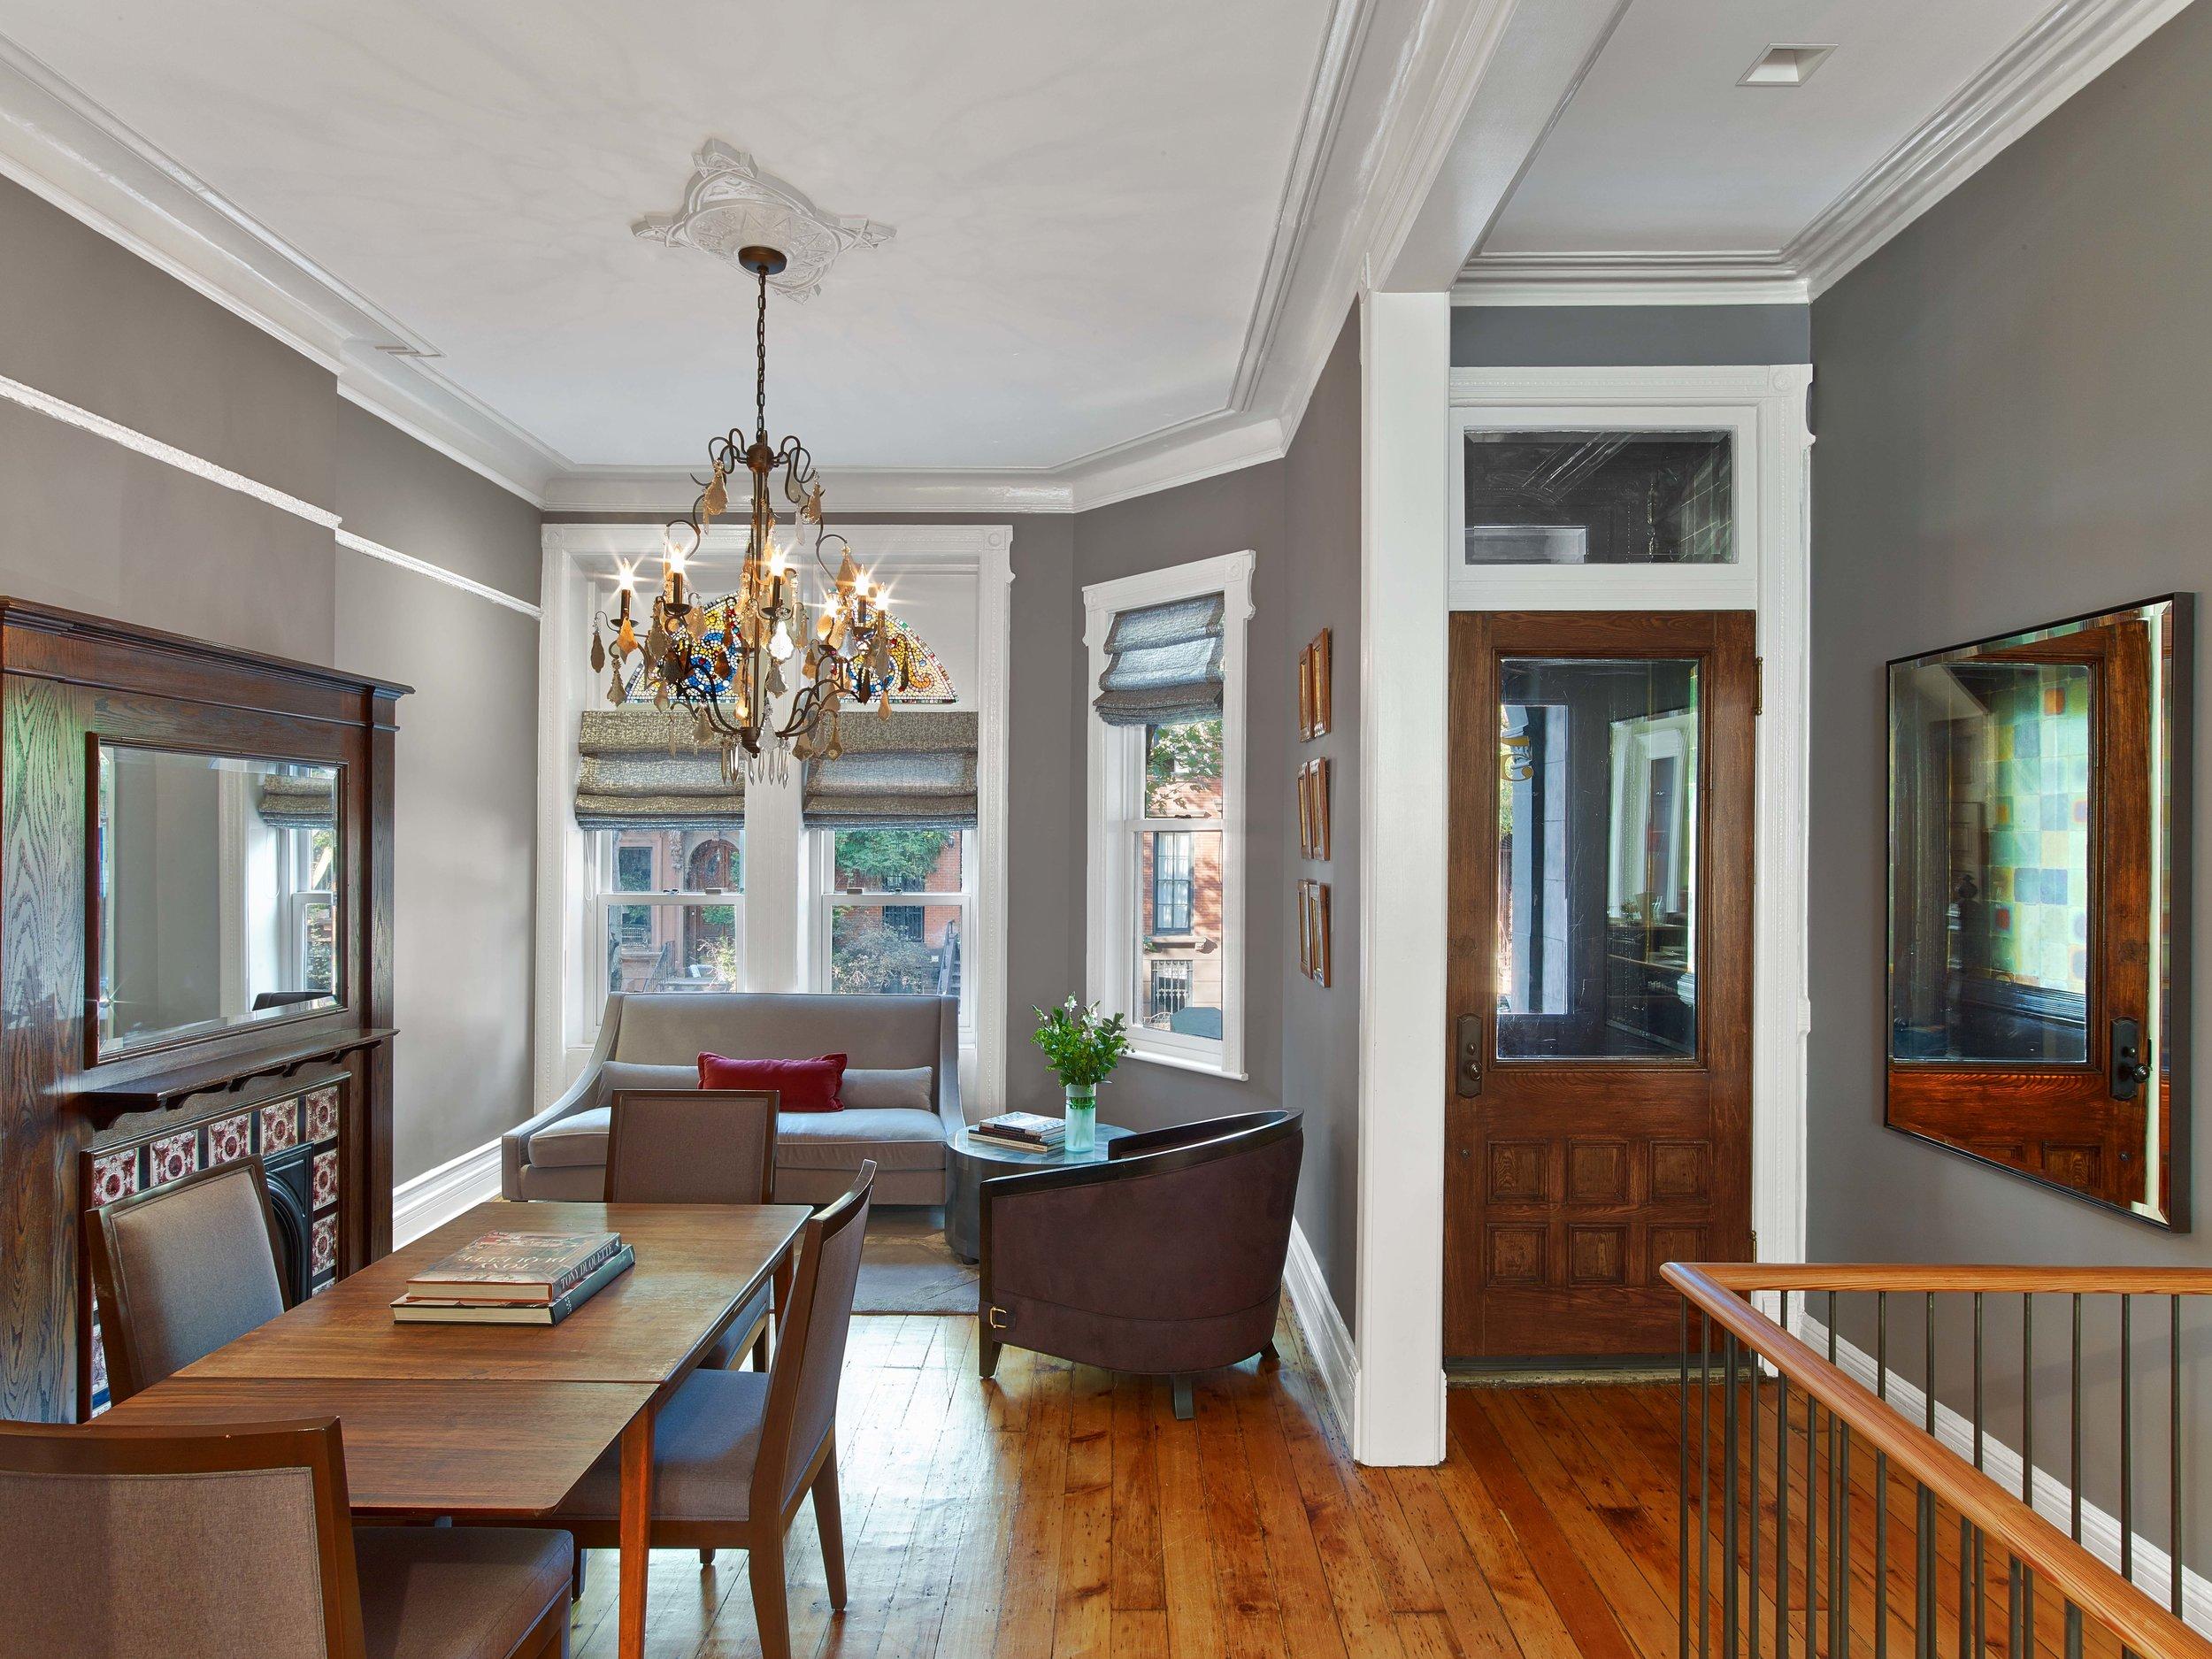 Entry-Way-Dining-Room-Combo-JMorris-Design-Brooklyn.jpg